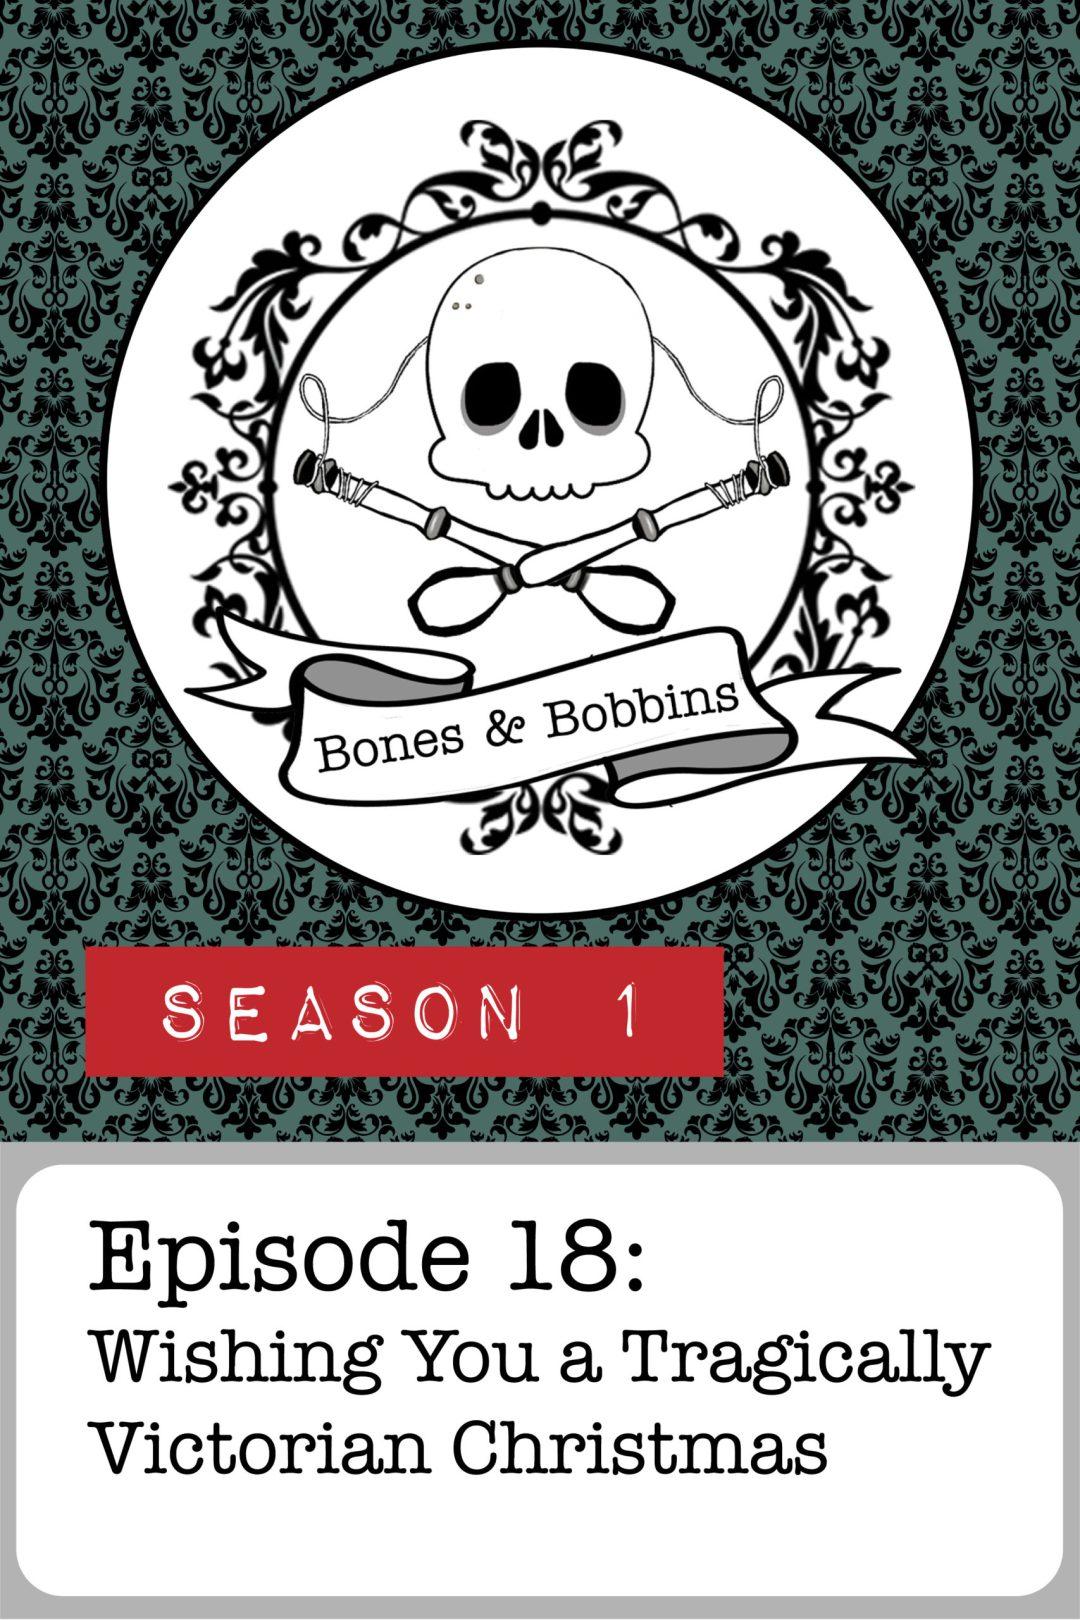 The Bones & Bobbins Podcast, Season 1, Episode 18: Wishing You a Tragically Victorian Christmas